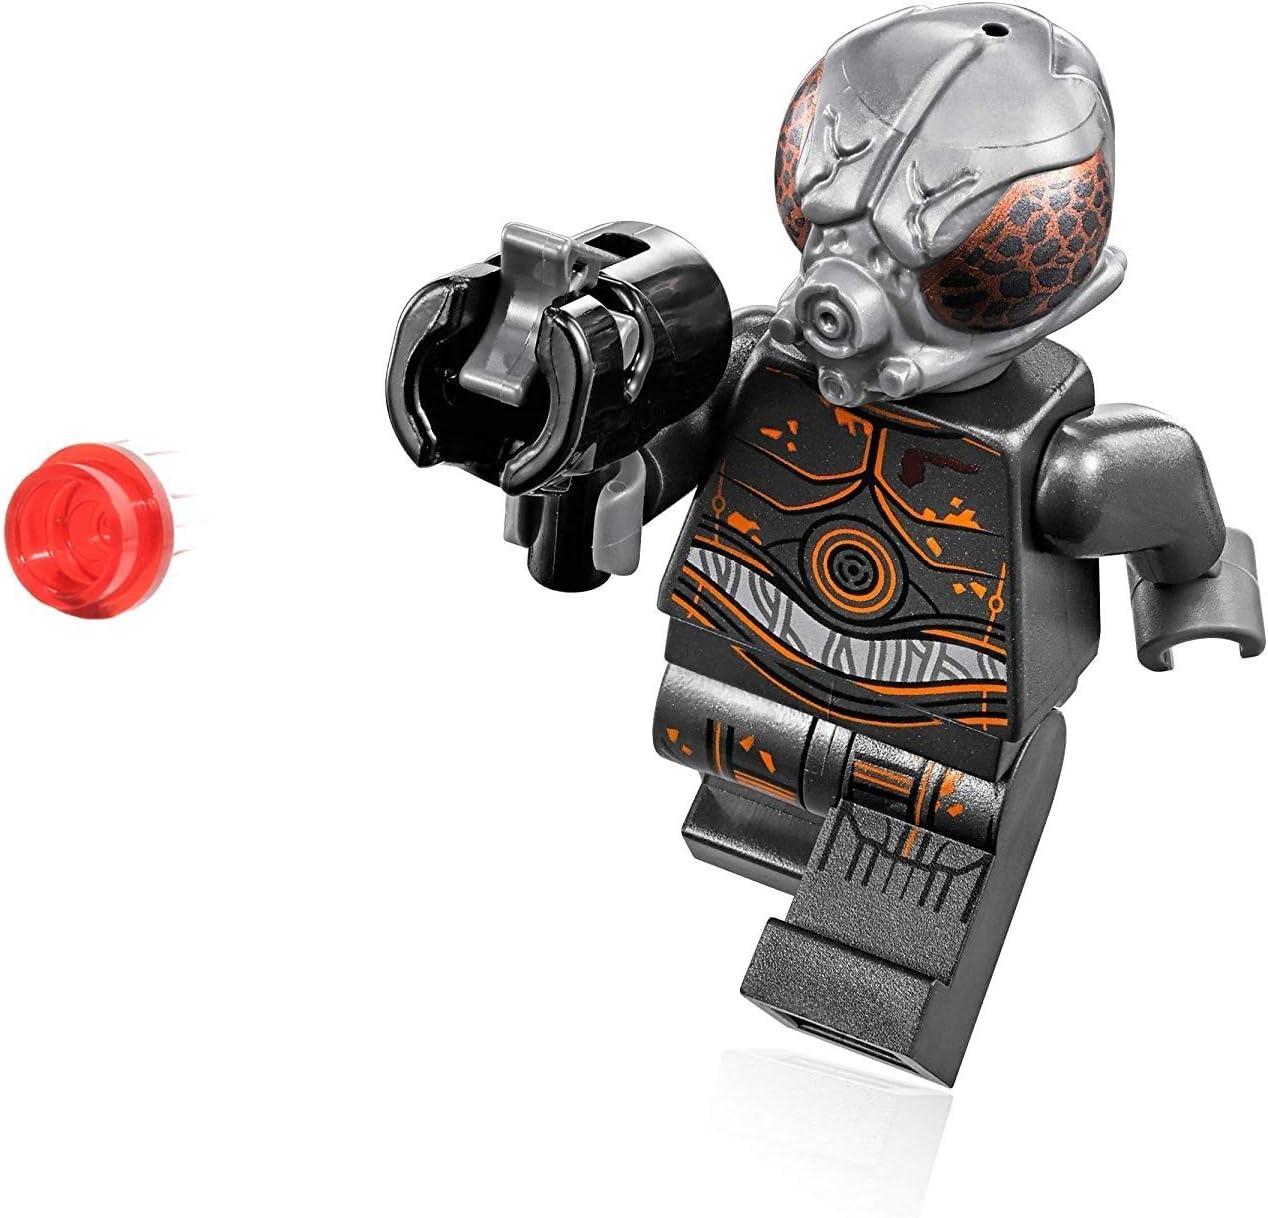 LEGO Star Wars - 4-LOM Minifigure with Blaster